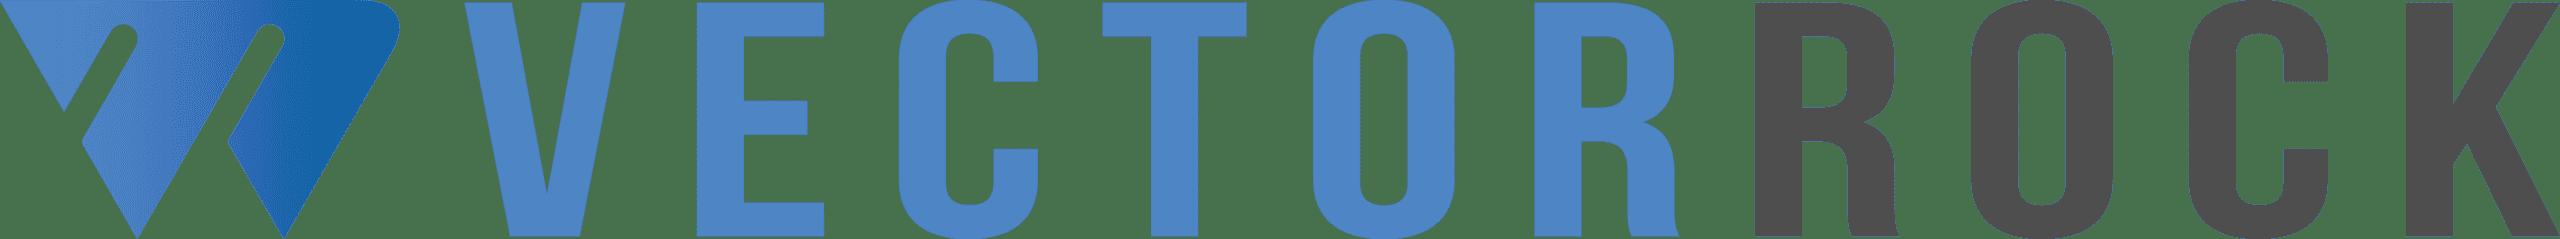 VectorRock logo